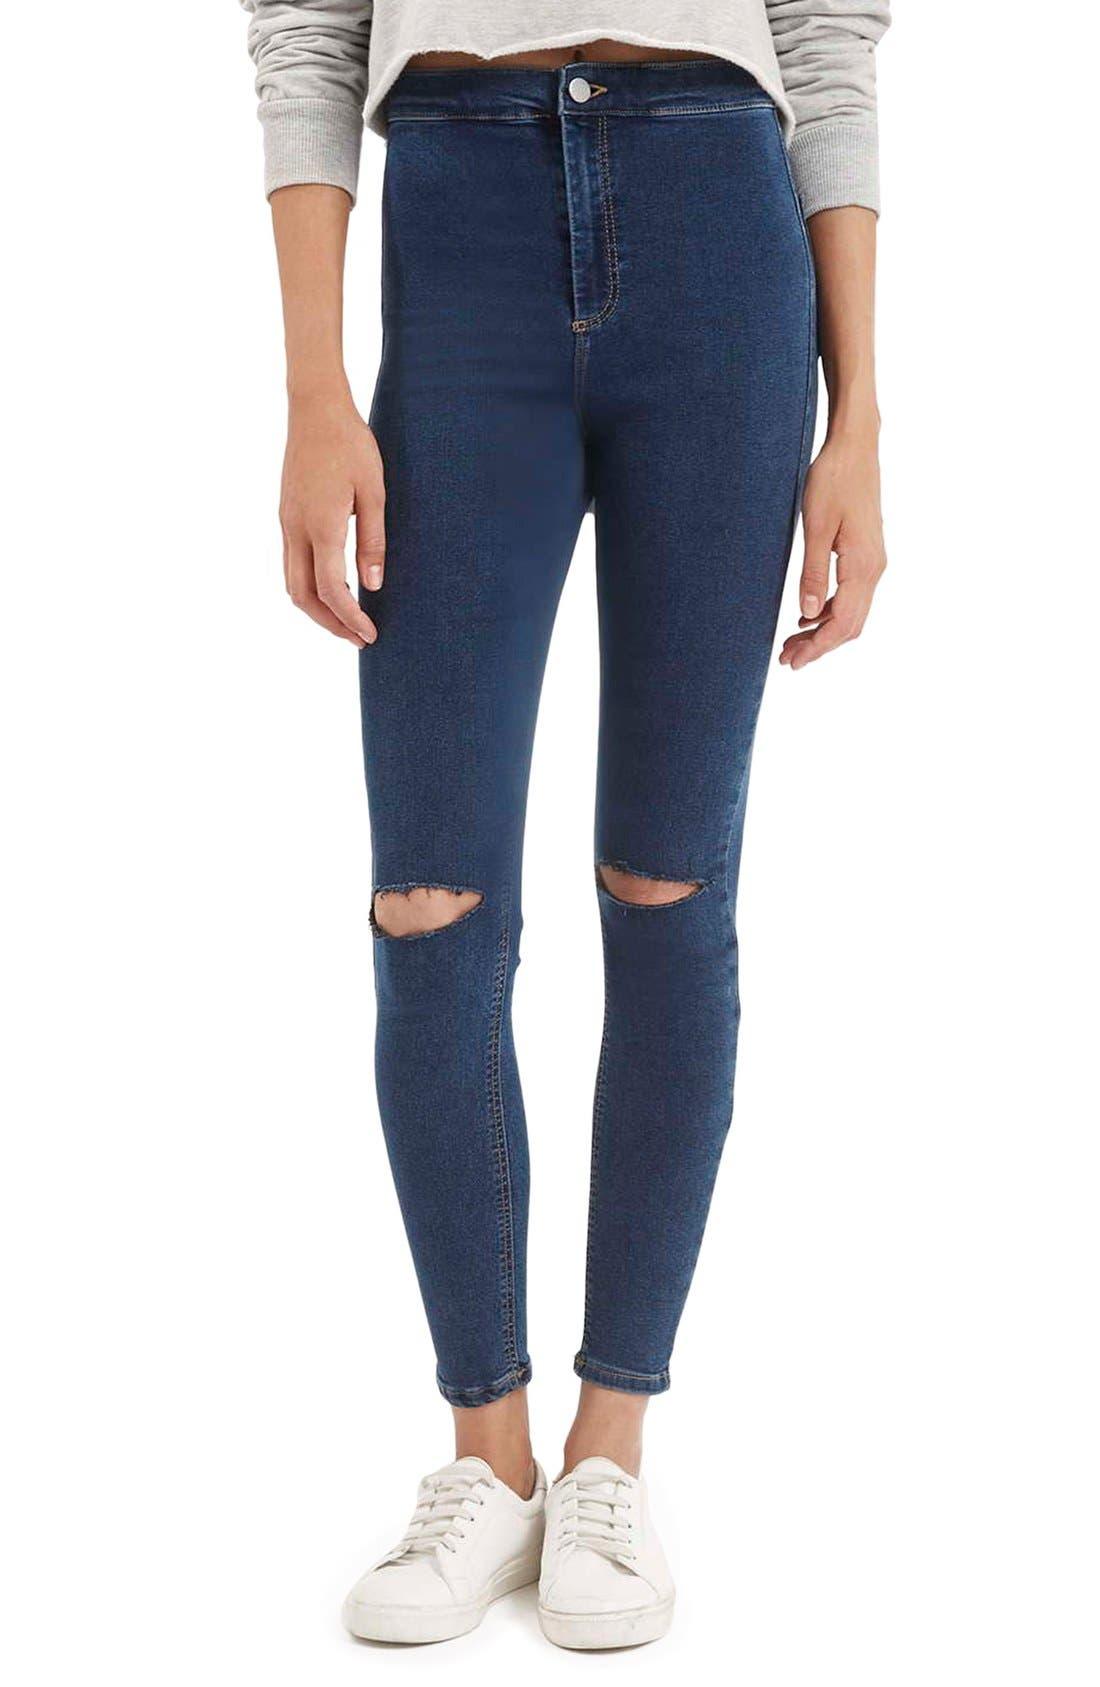 Alternate Image 1 Selected - Topshop Moto'Joni' Ripped High Rise Skinny Jeans (Regular & Short)